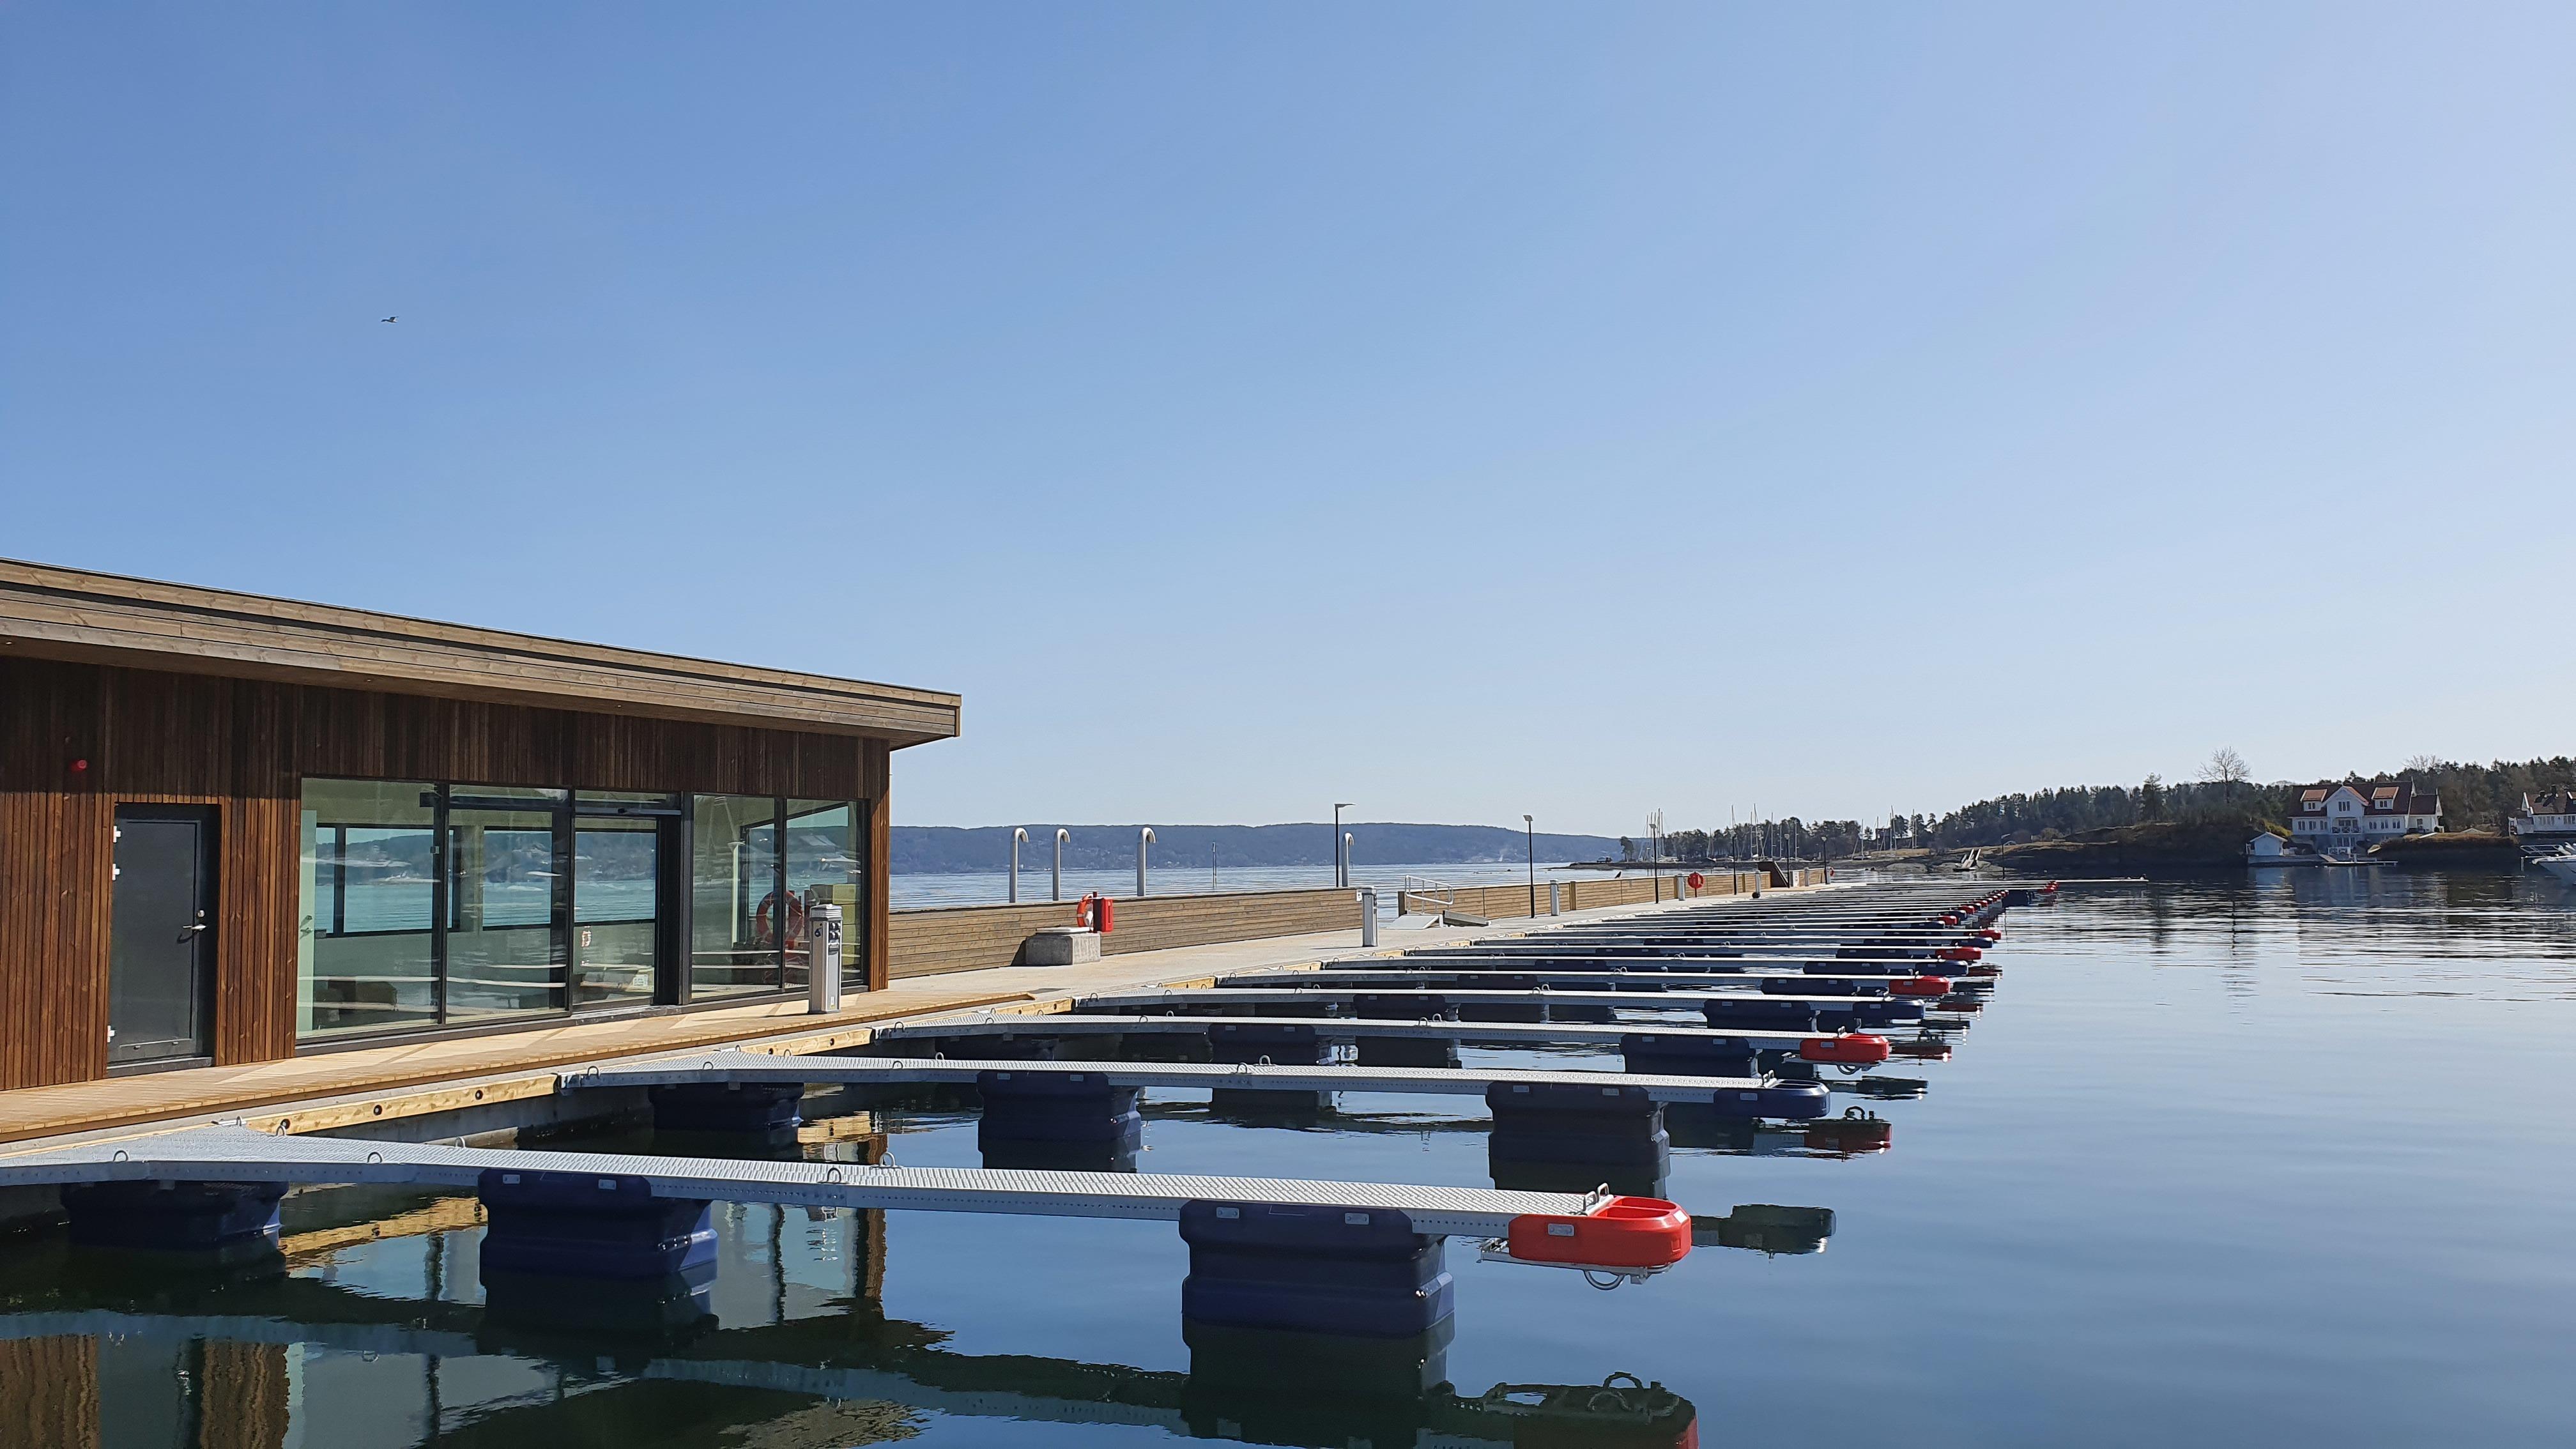 https://marinasolutions.no/uploads/Vollen-Marina-gjestehavn-og-flytemolo-3.jpg